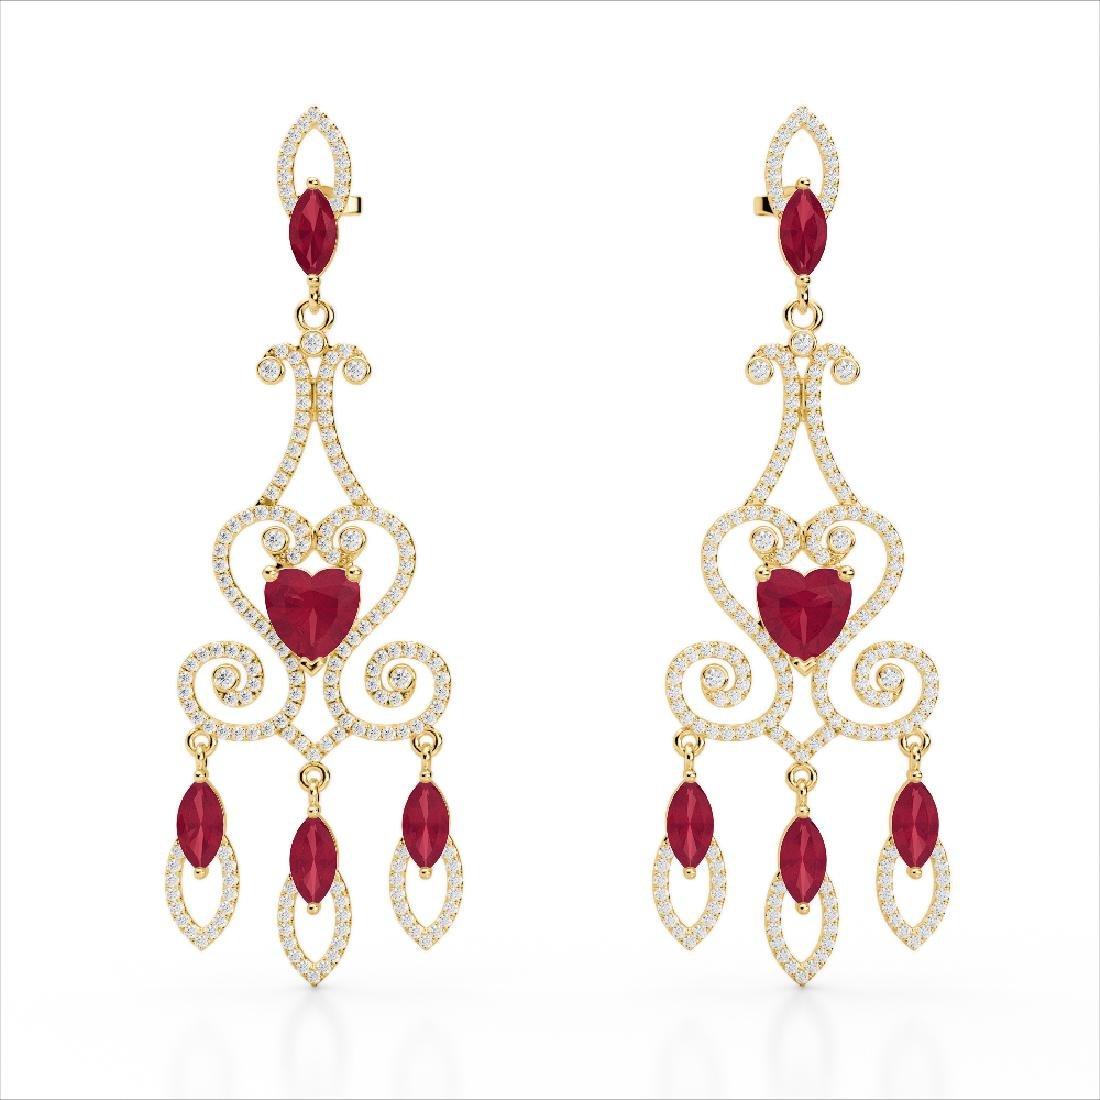 11 CTW Ruby & Micro Pave VS/SI Diamond Earrings 14K - 2